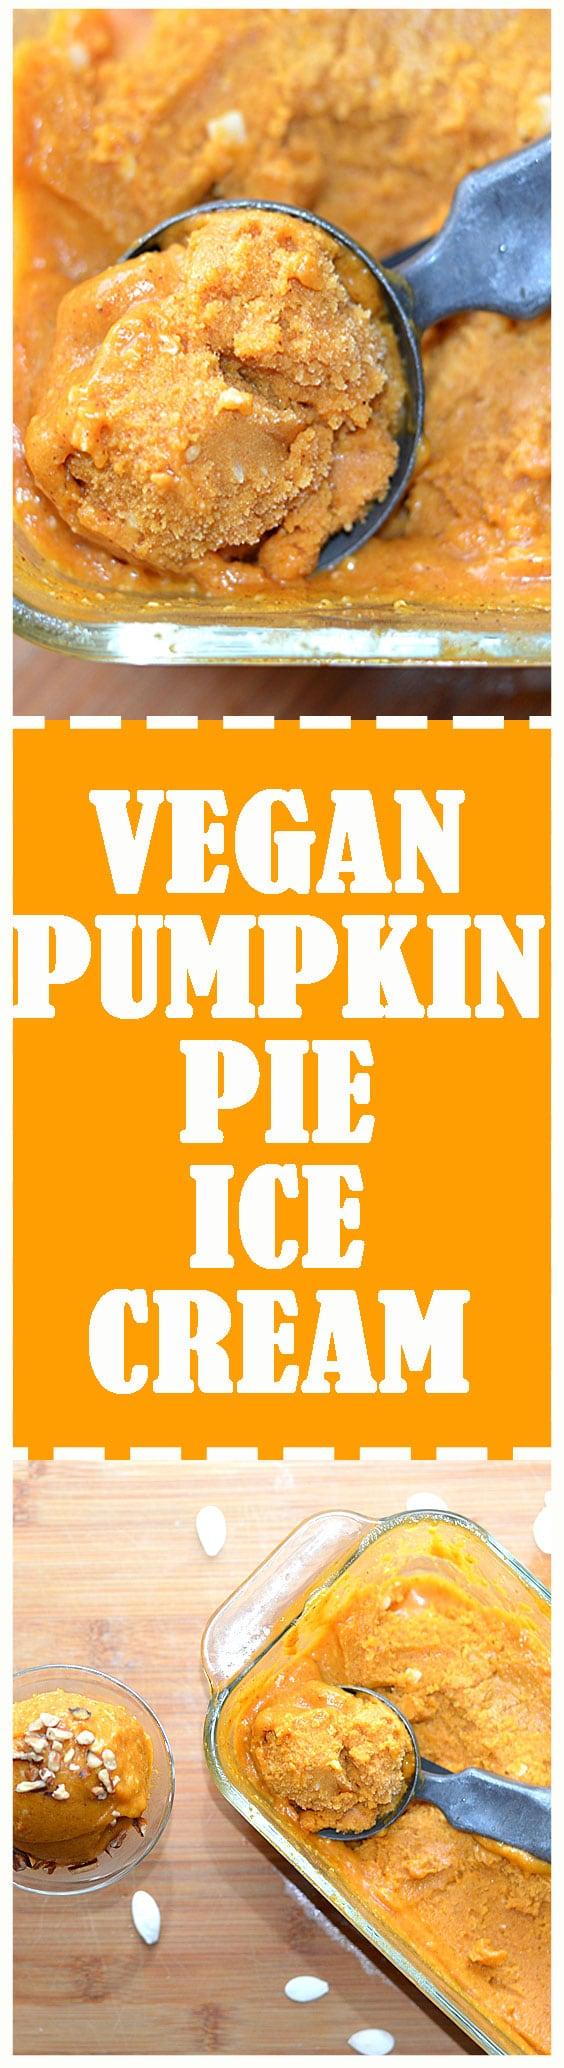 pumpkin-ice-cream-pinterest